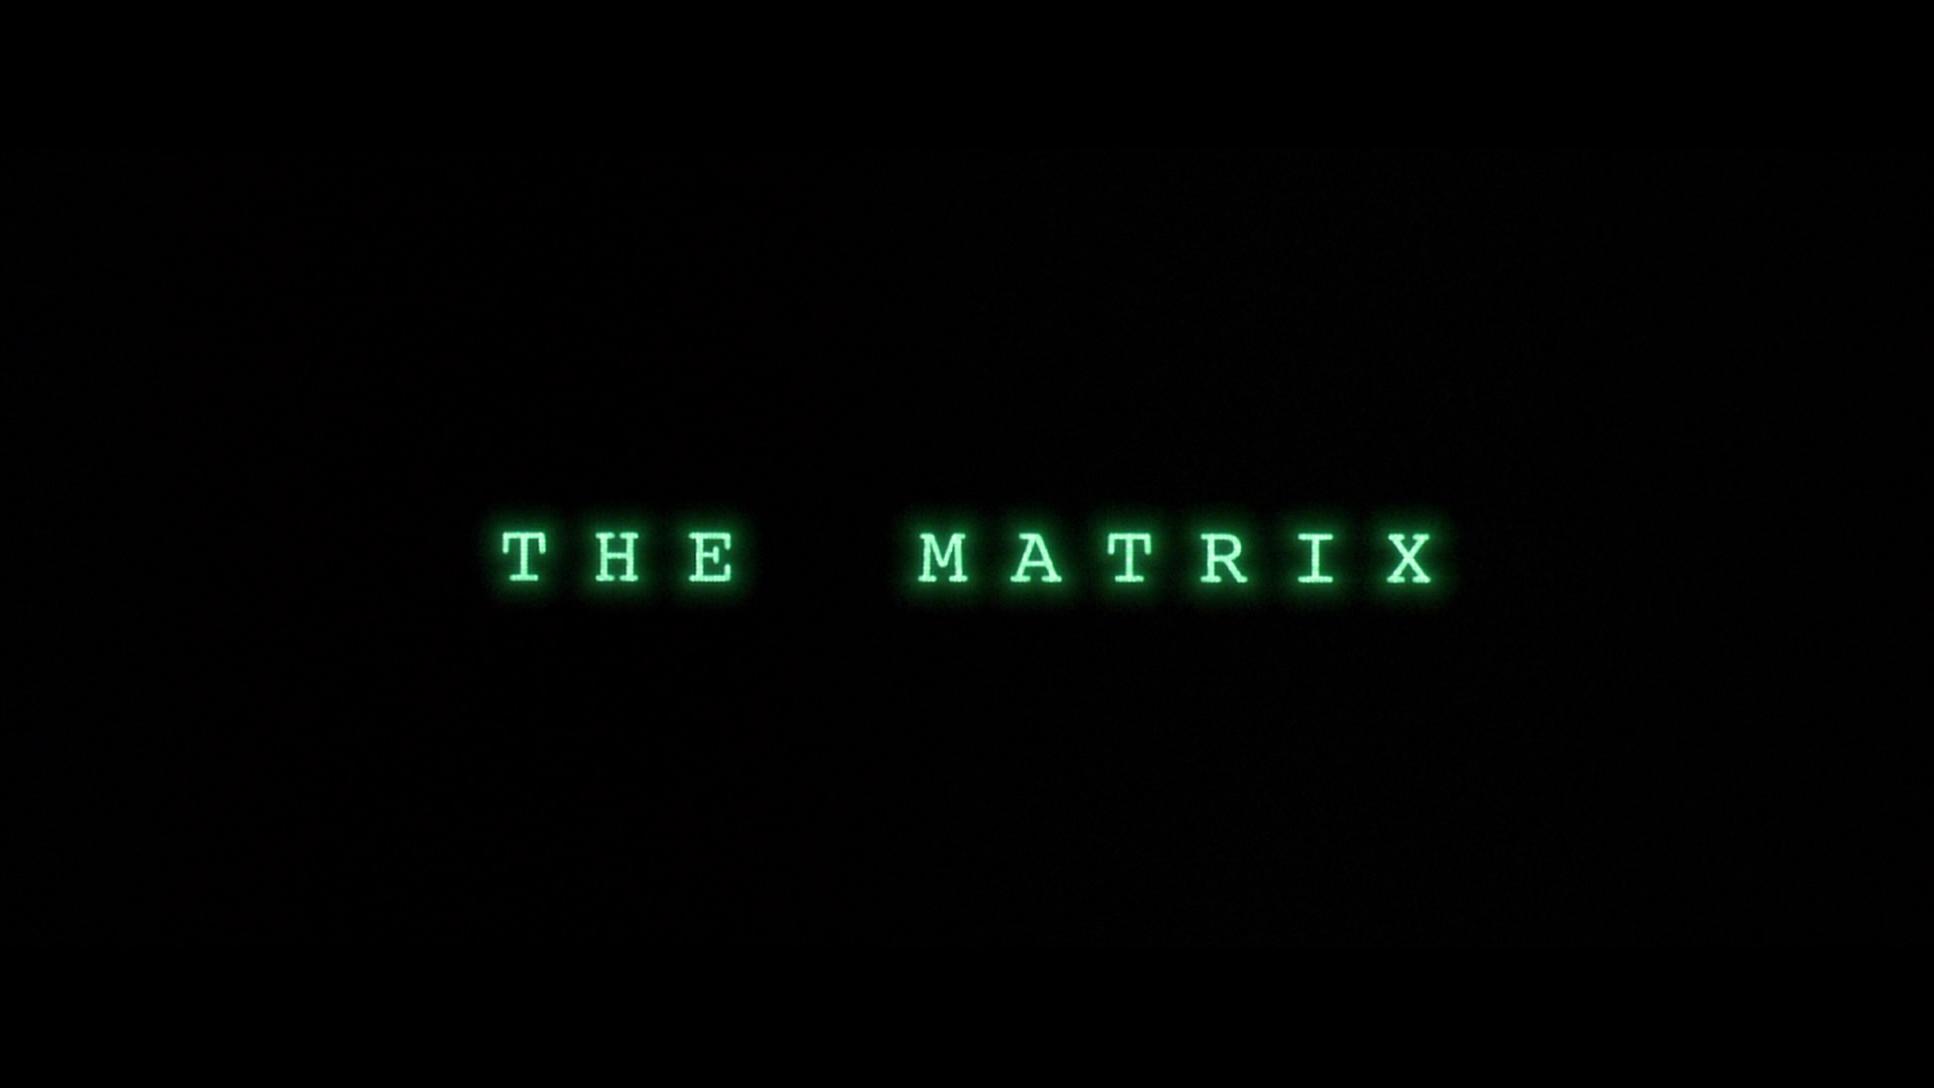 thematrix_0002a.jpg